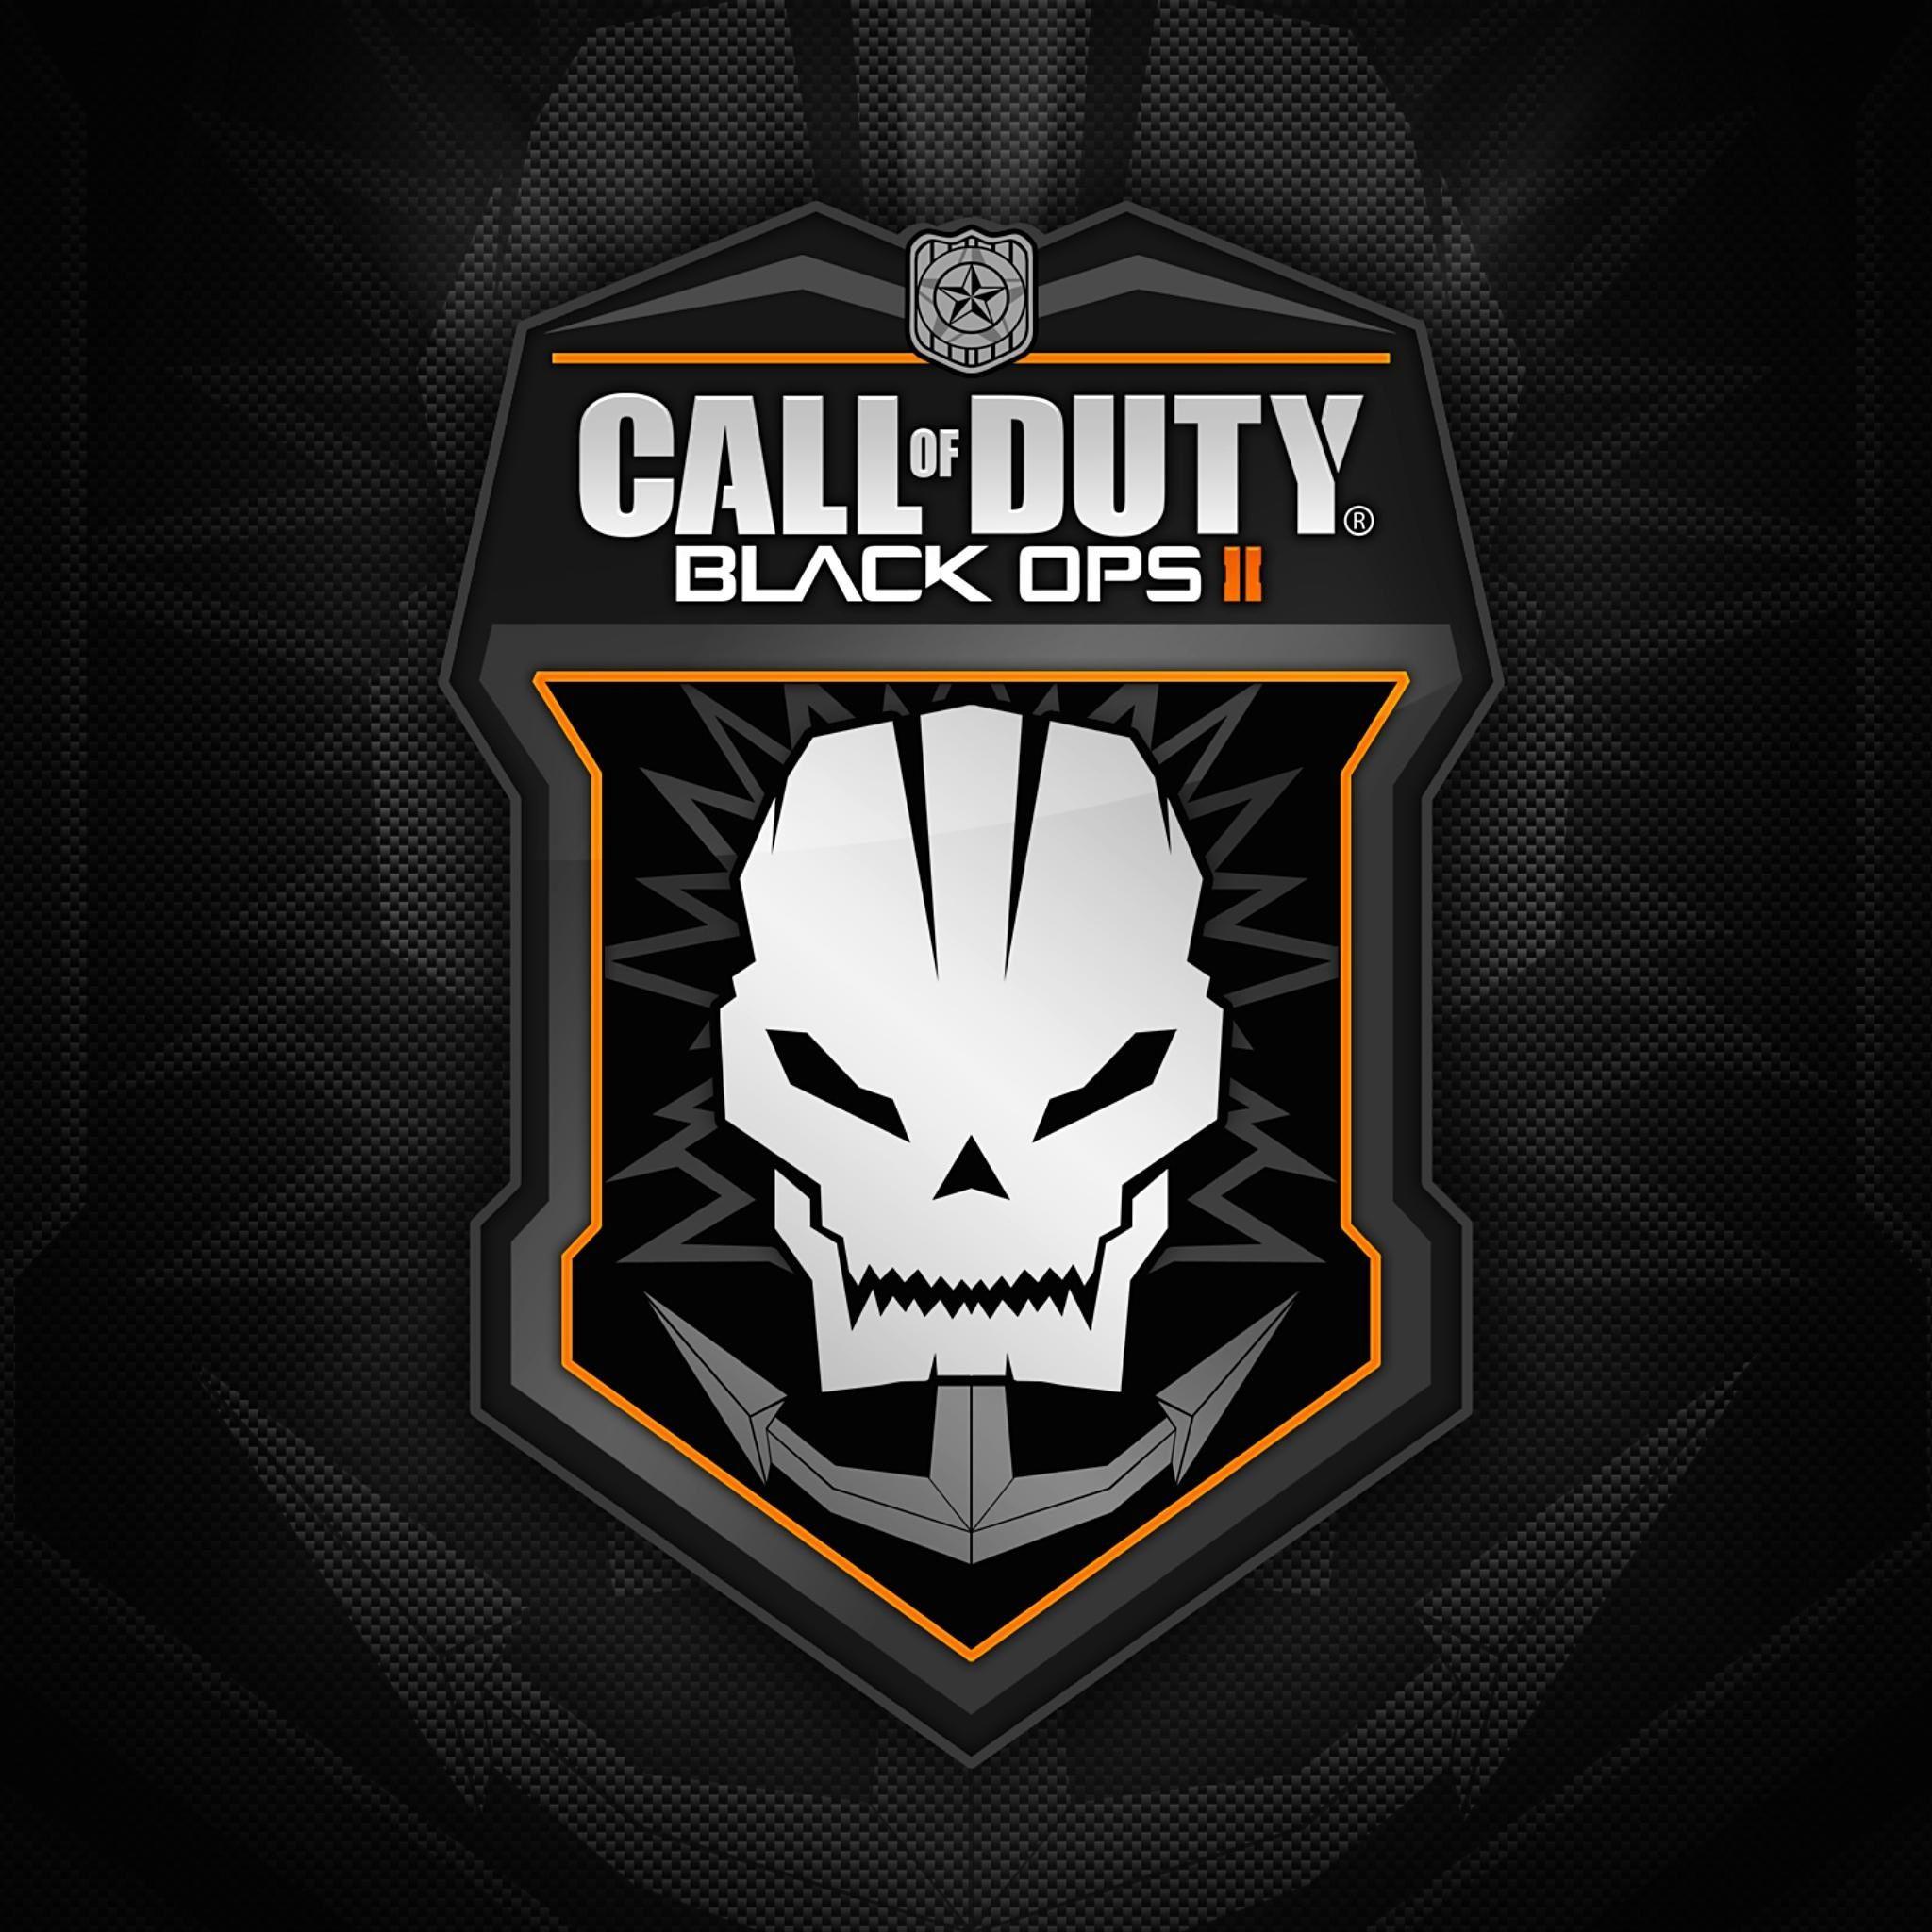 Call Of Duty Black Ops 2 Call Of Duty Black Ops 3 Call Of Duty Call Of Duty Black